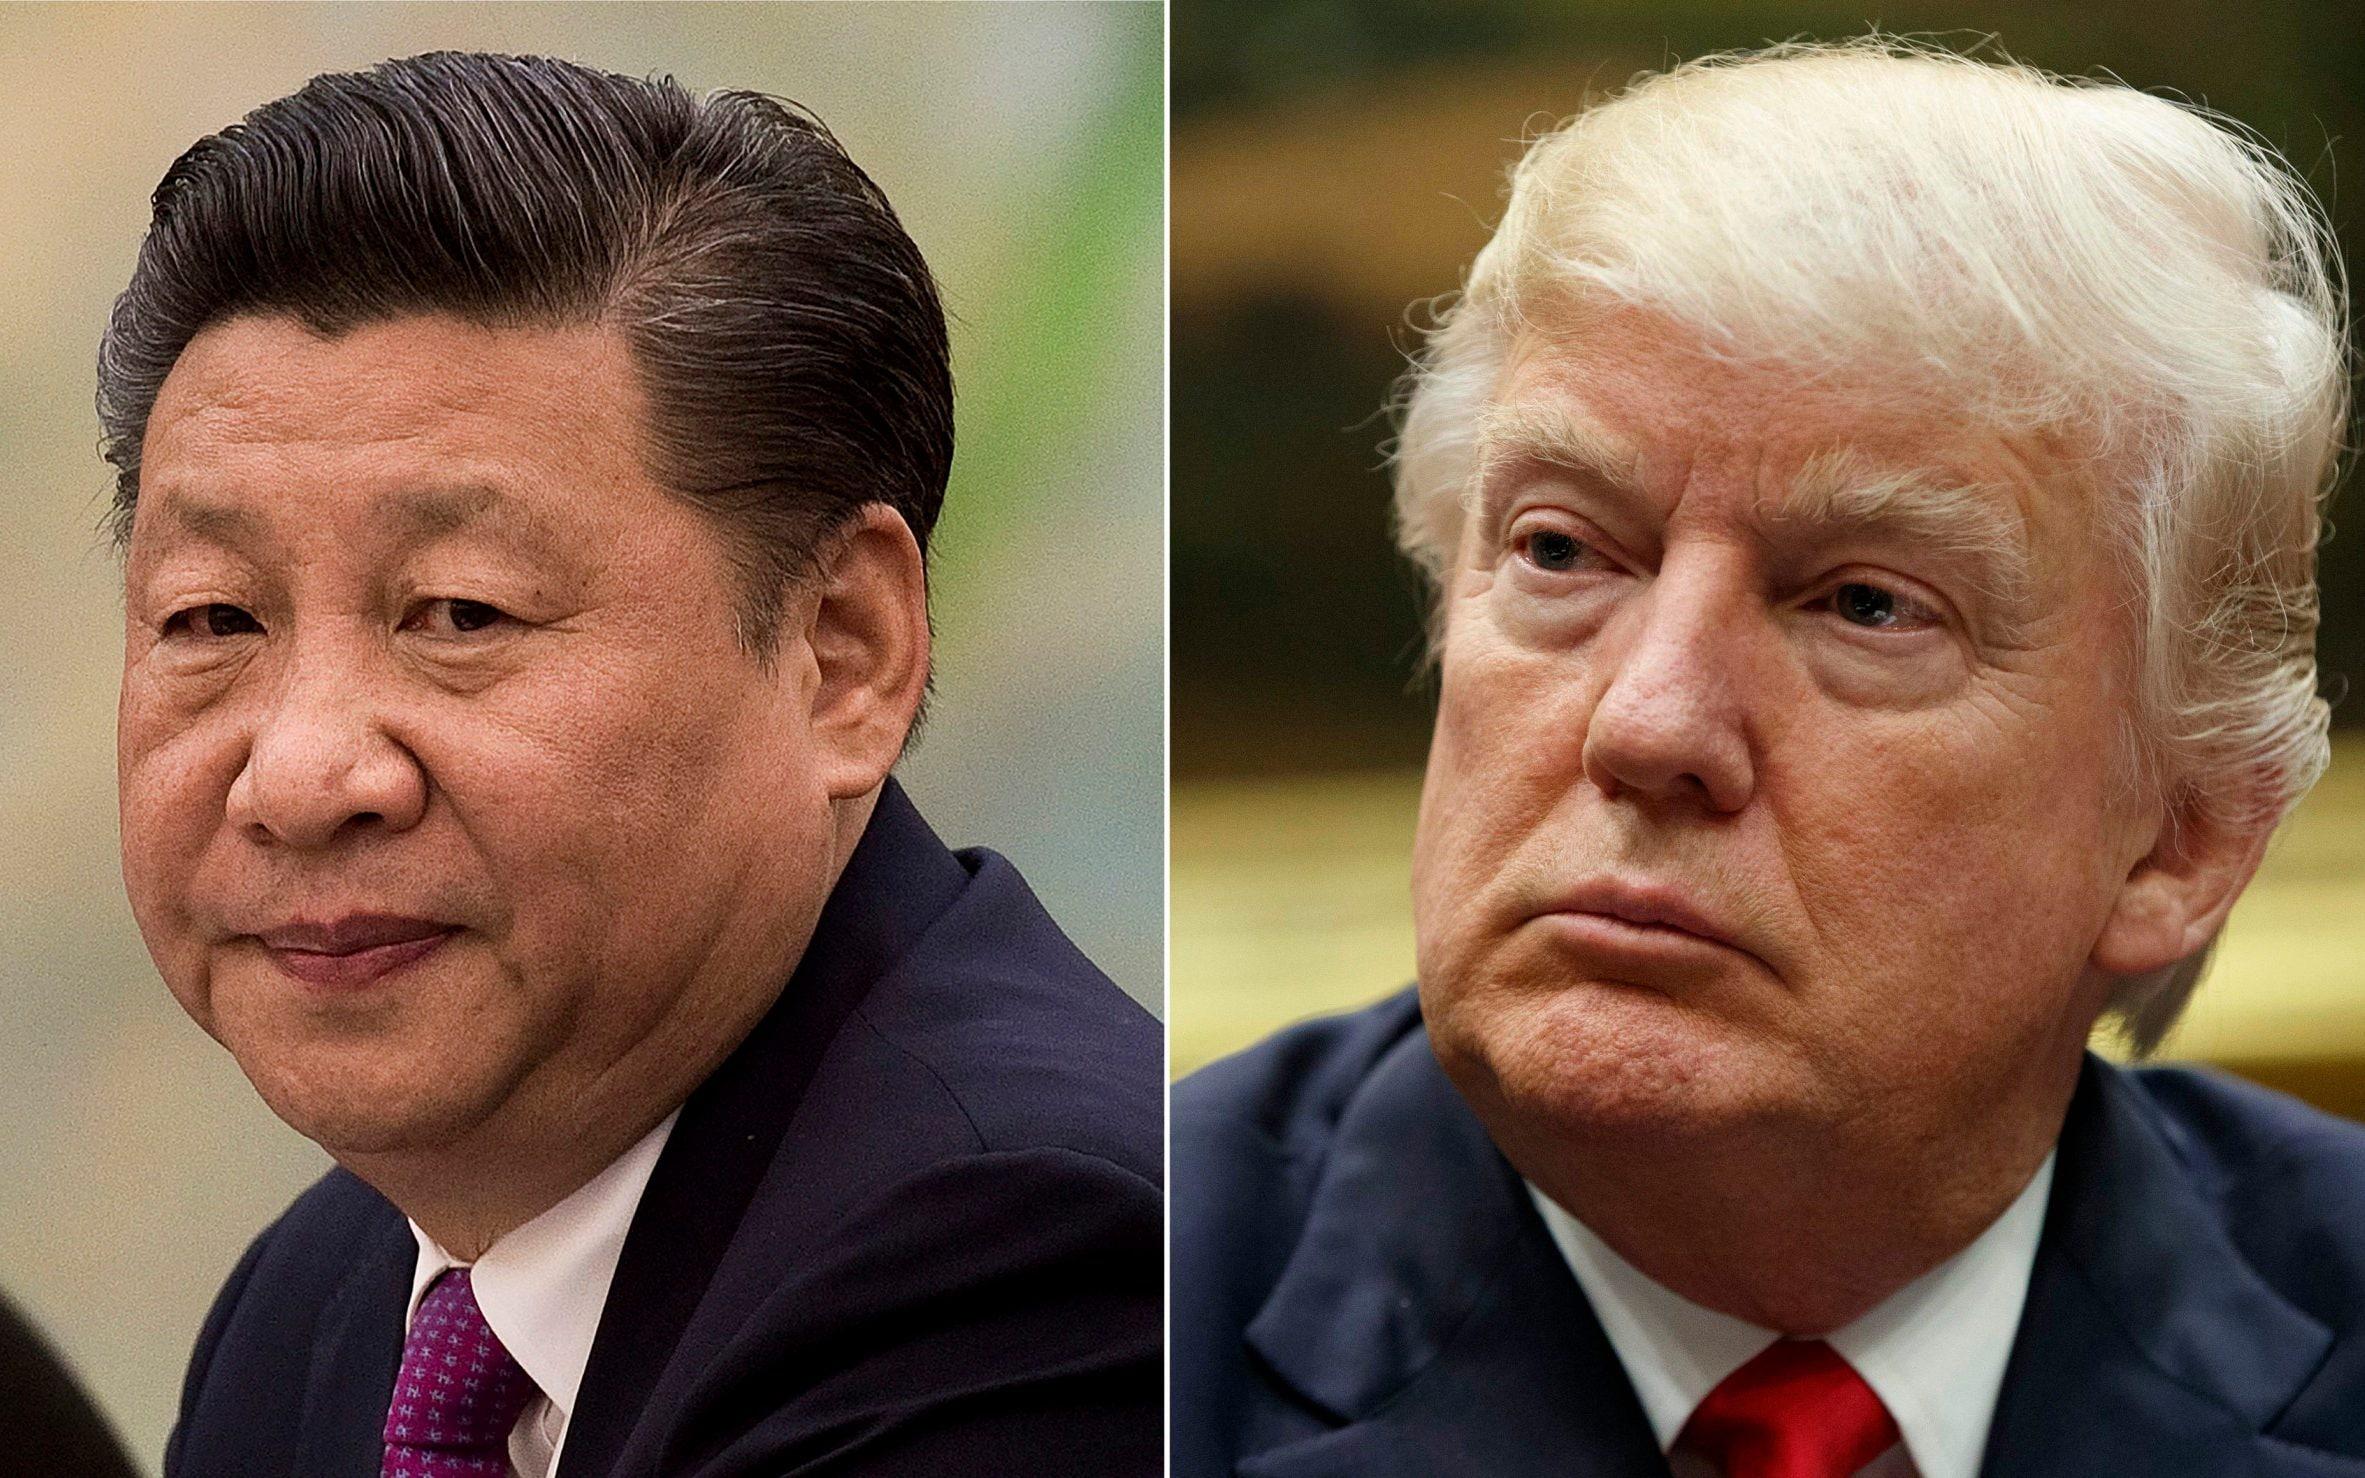 Trump steps up anti-China rhetoric threatening very strong response if Hong Kong law passes